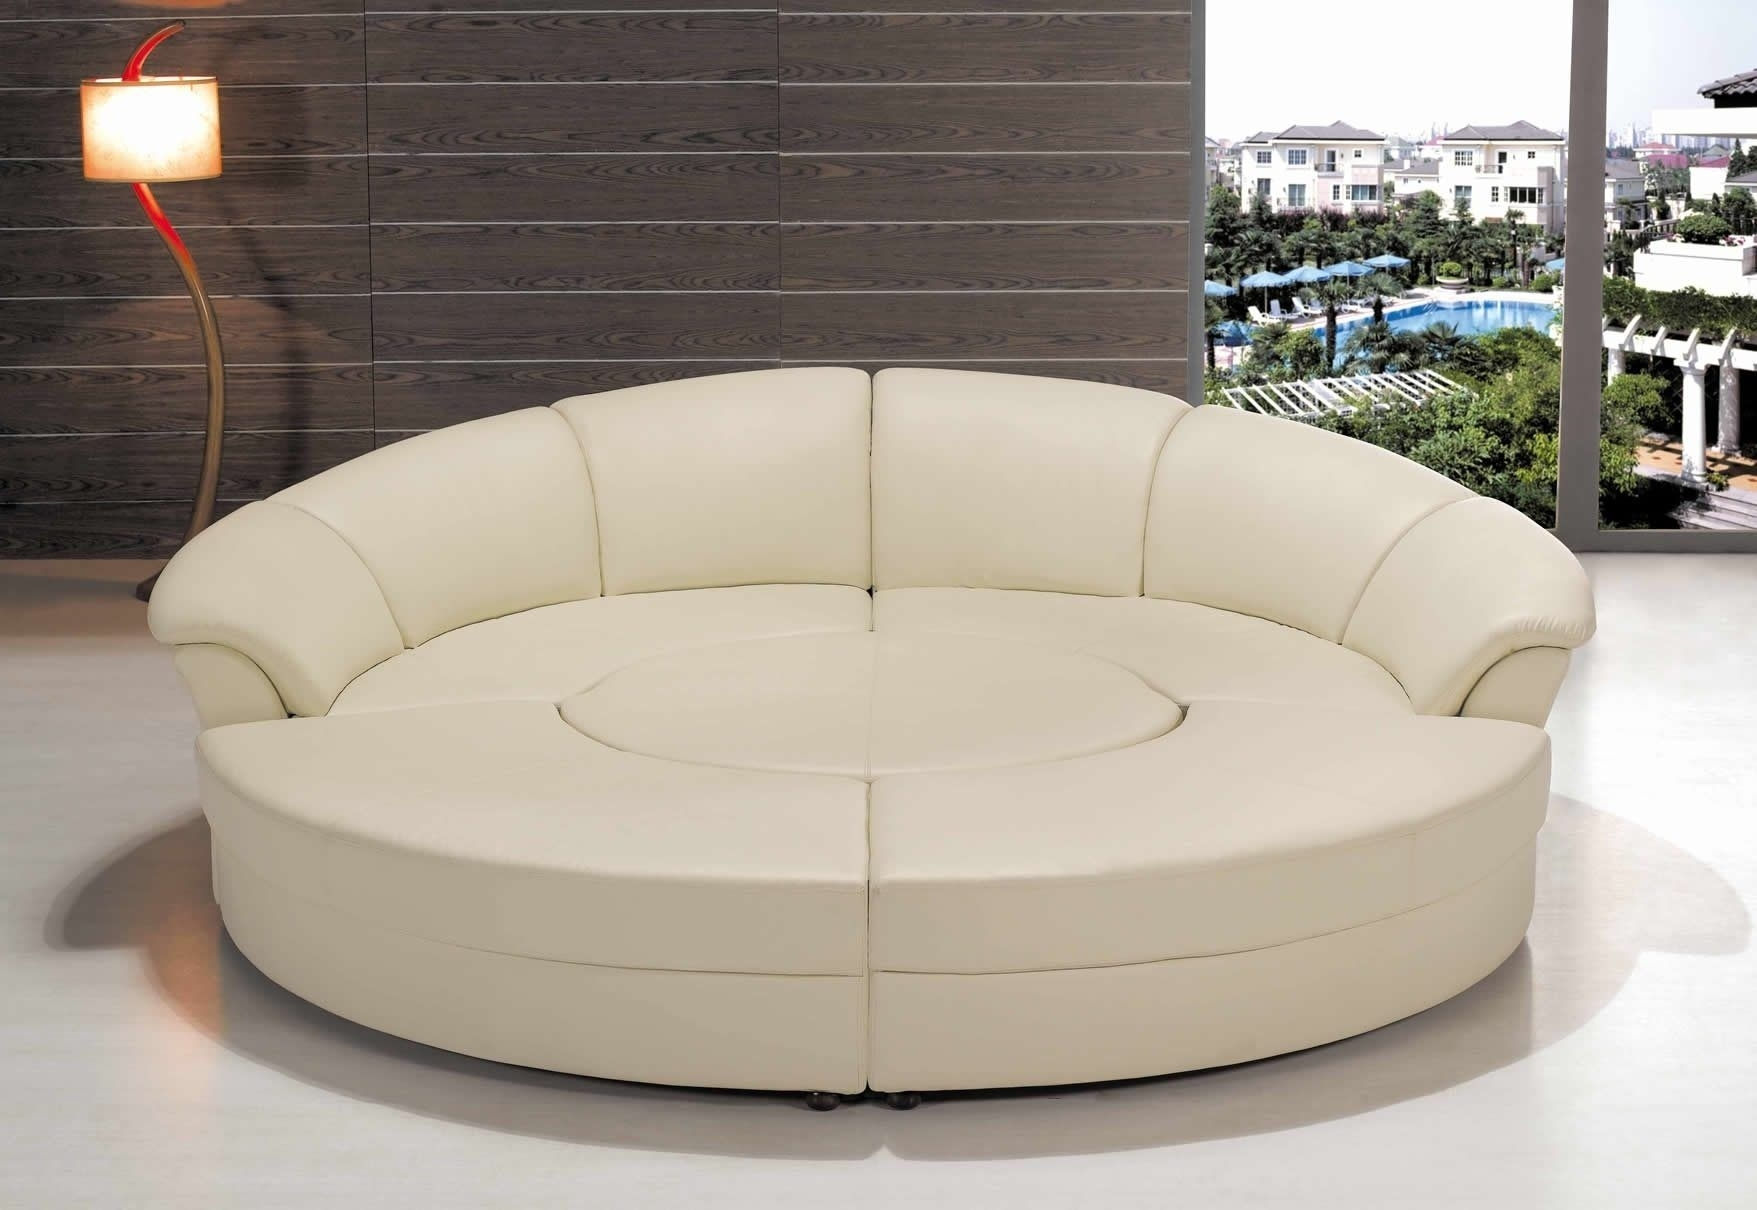 Semi Circular Sectional Sofa 2 – Semi Circular Sofa Uk, Sofa | Stuff Regarding Semicircular Sofas (View 6 of 10)